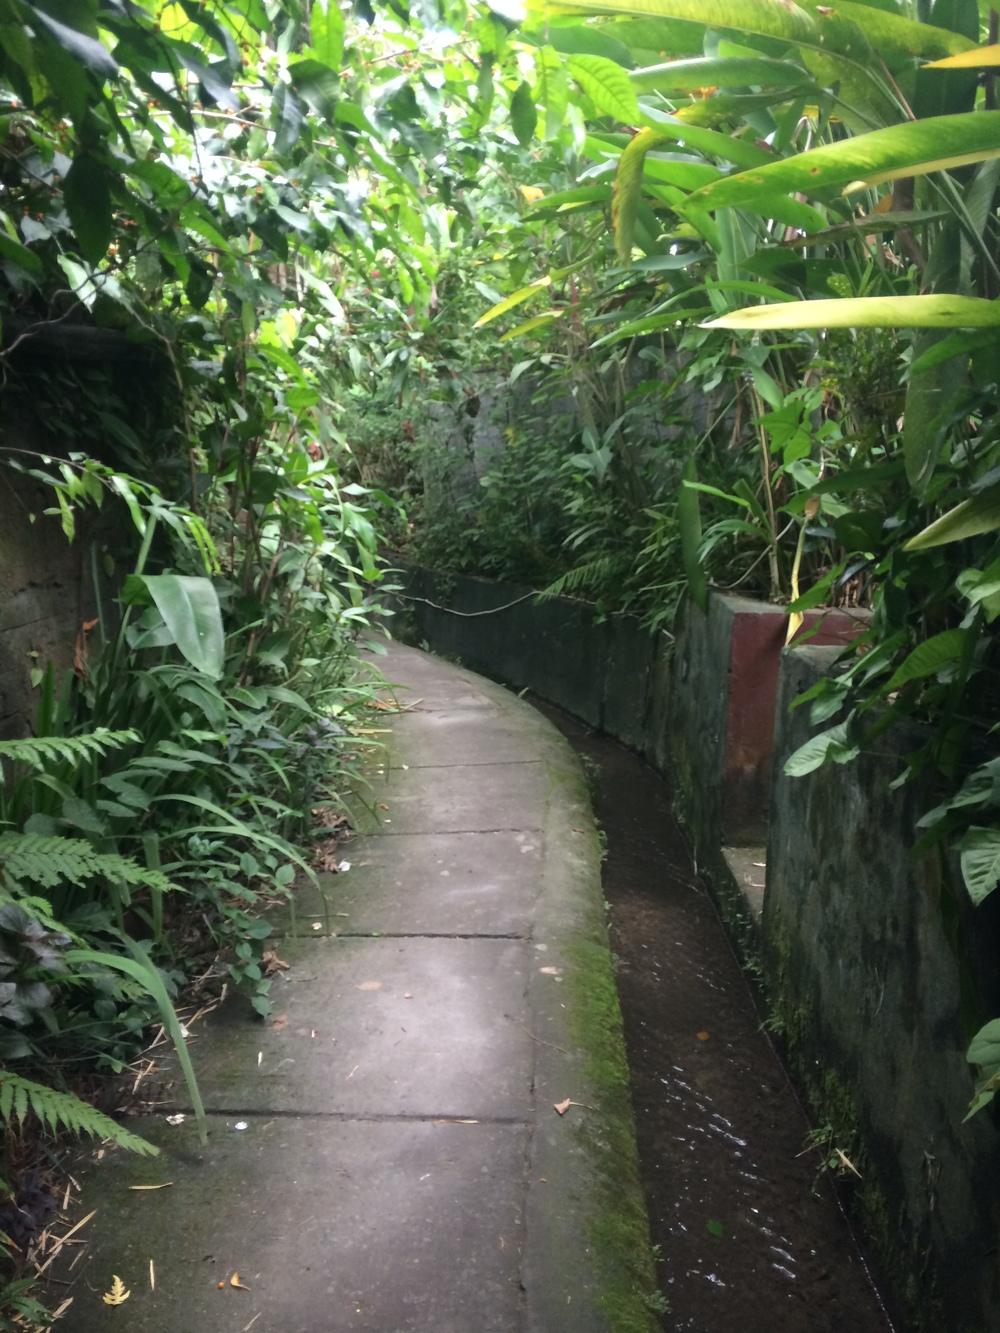 Beautiful little alleys...stop stealing my heart!